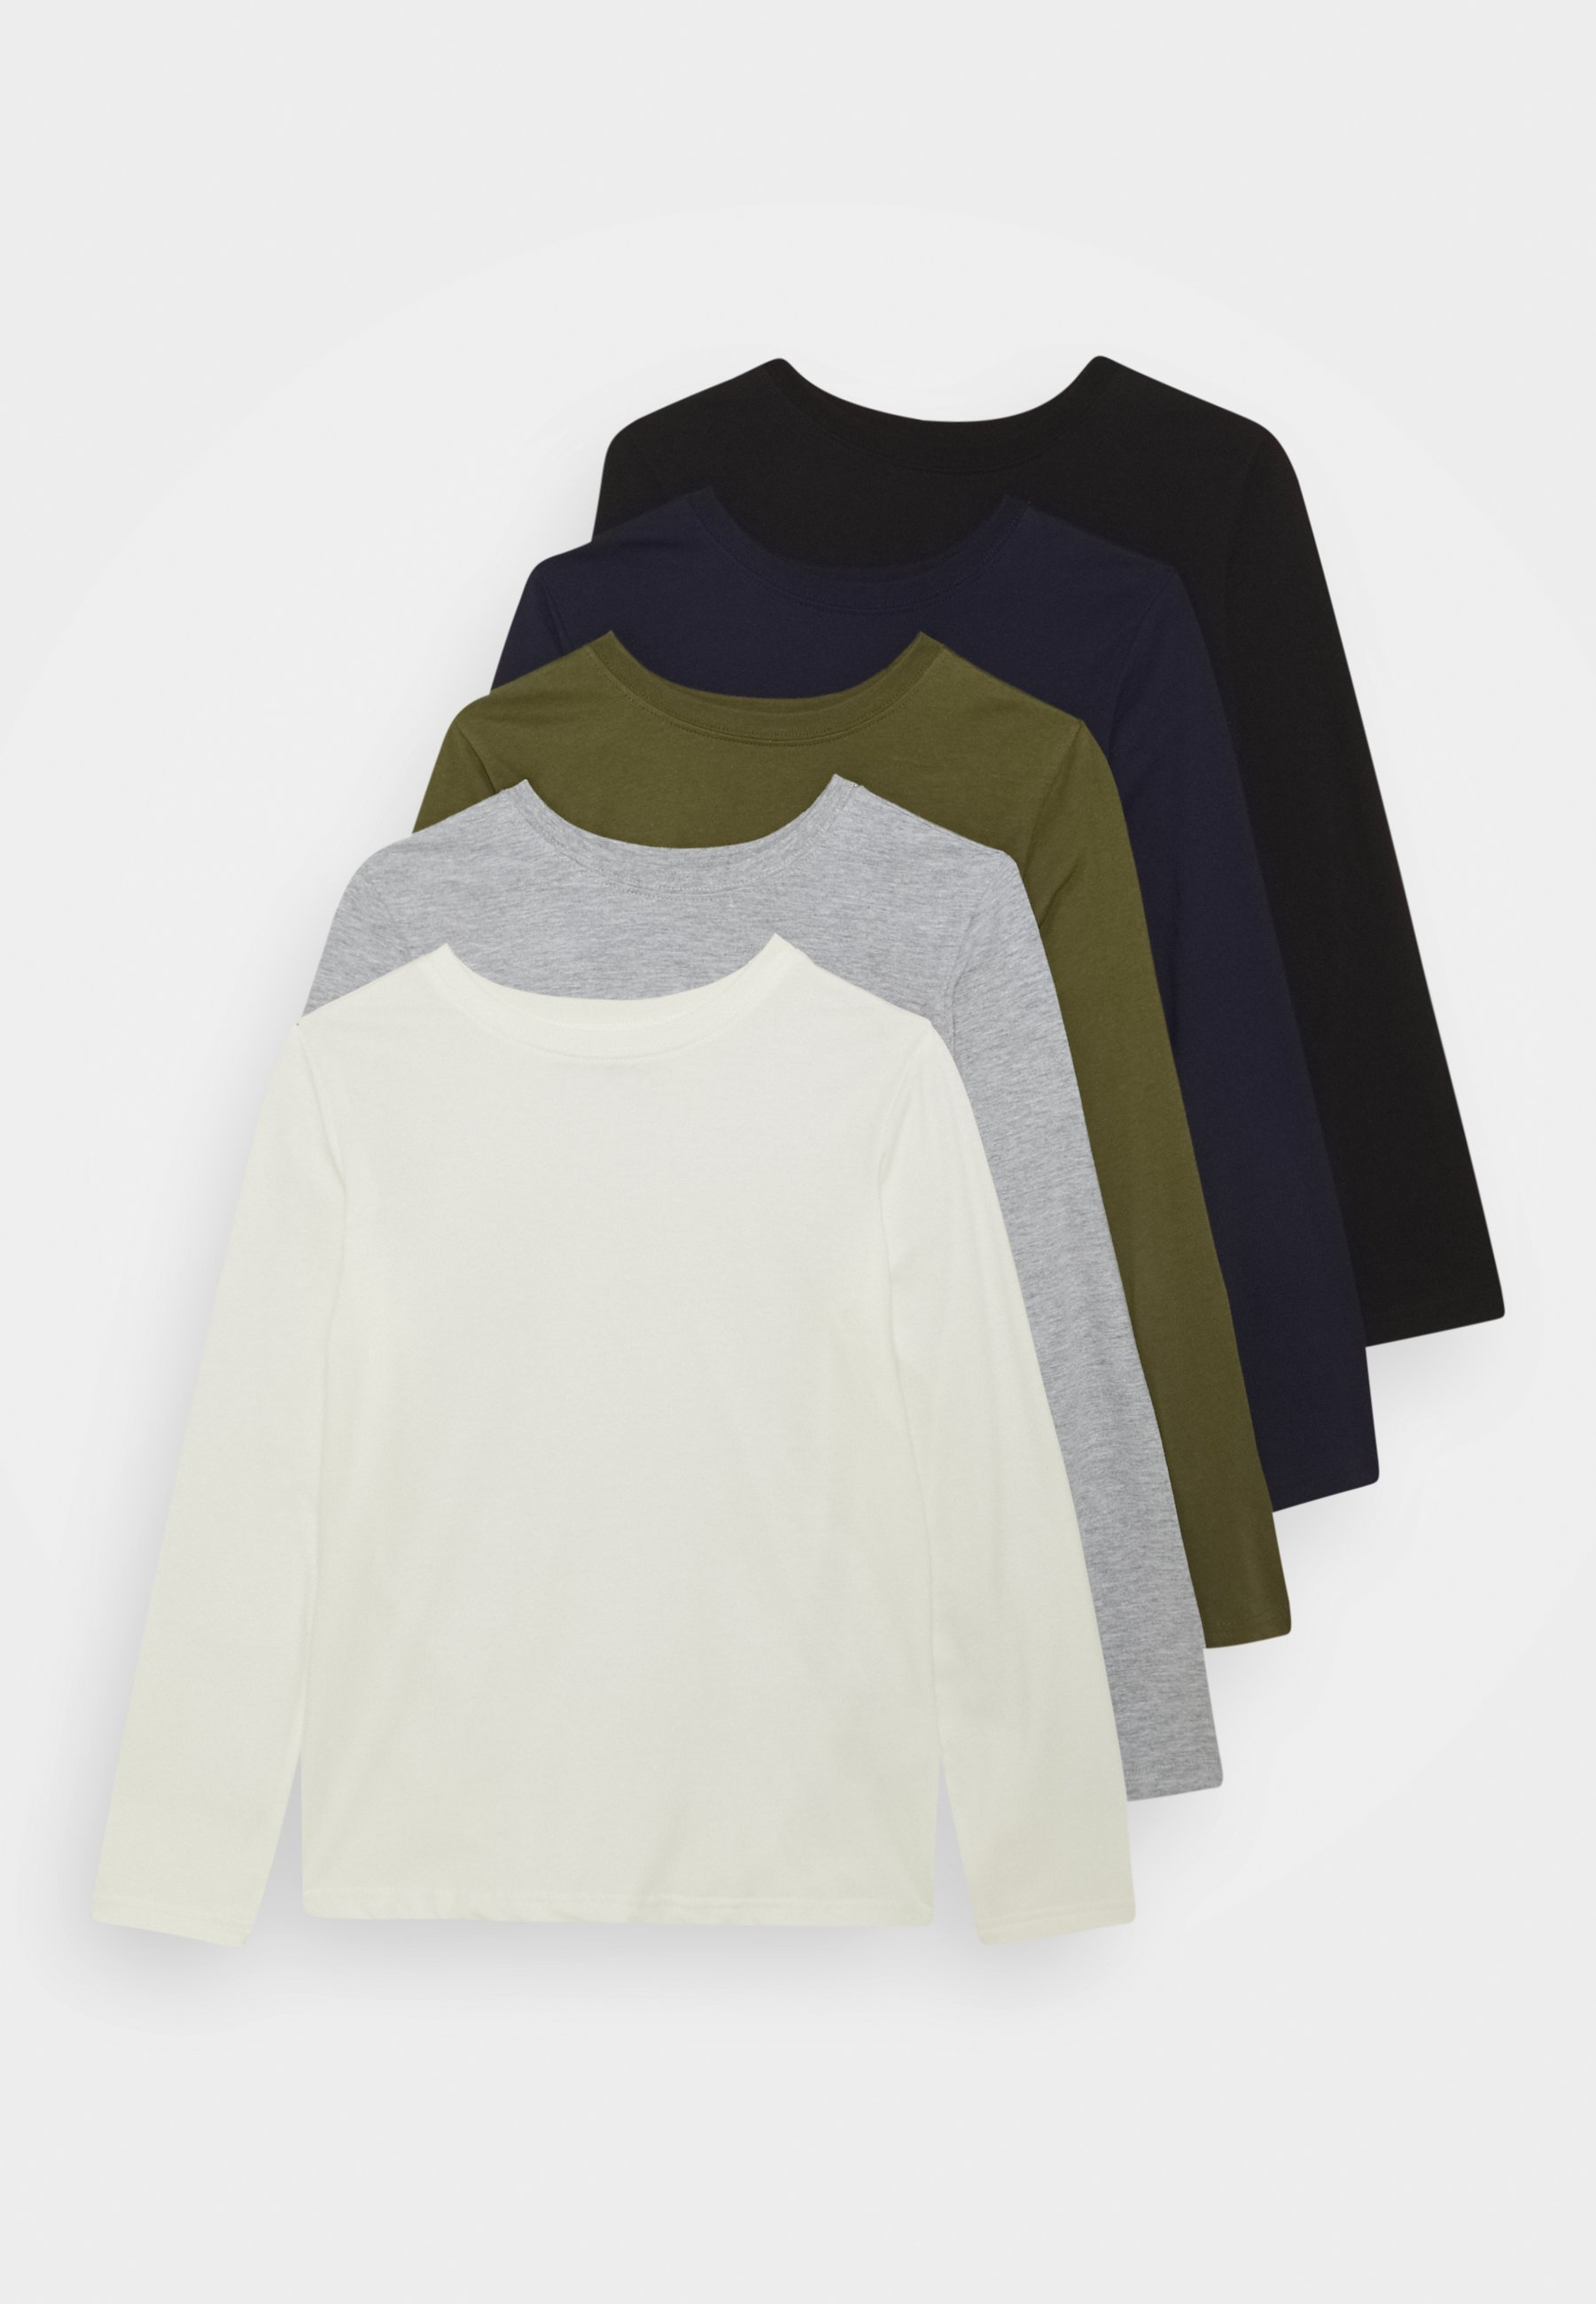 5 PACK T shirt à manches longues whitelight greydark blueblackgreen